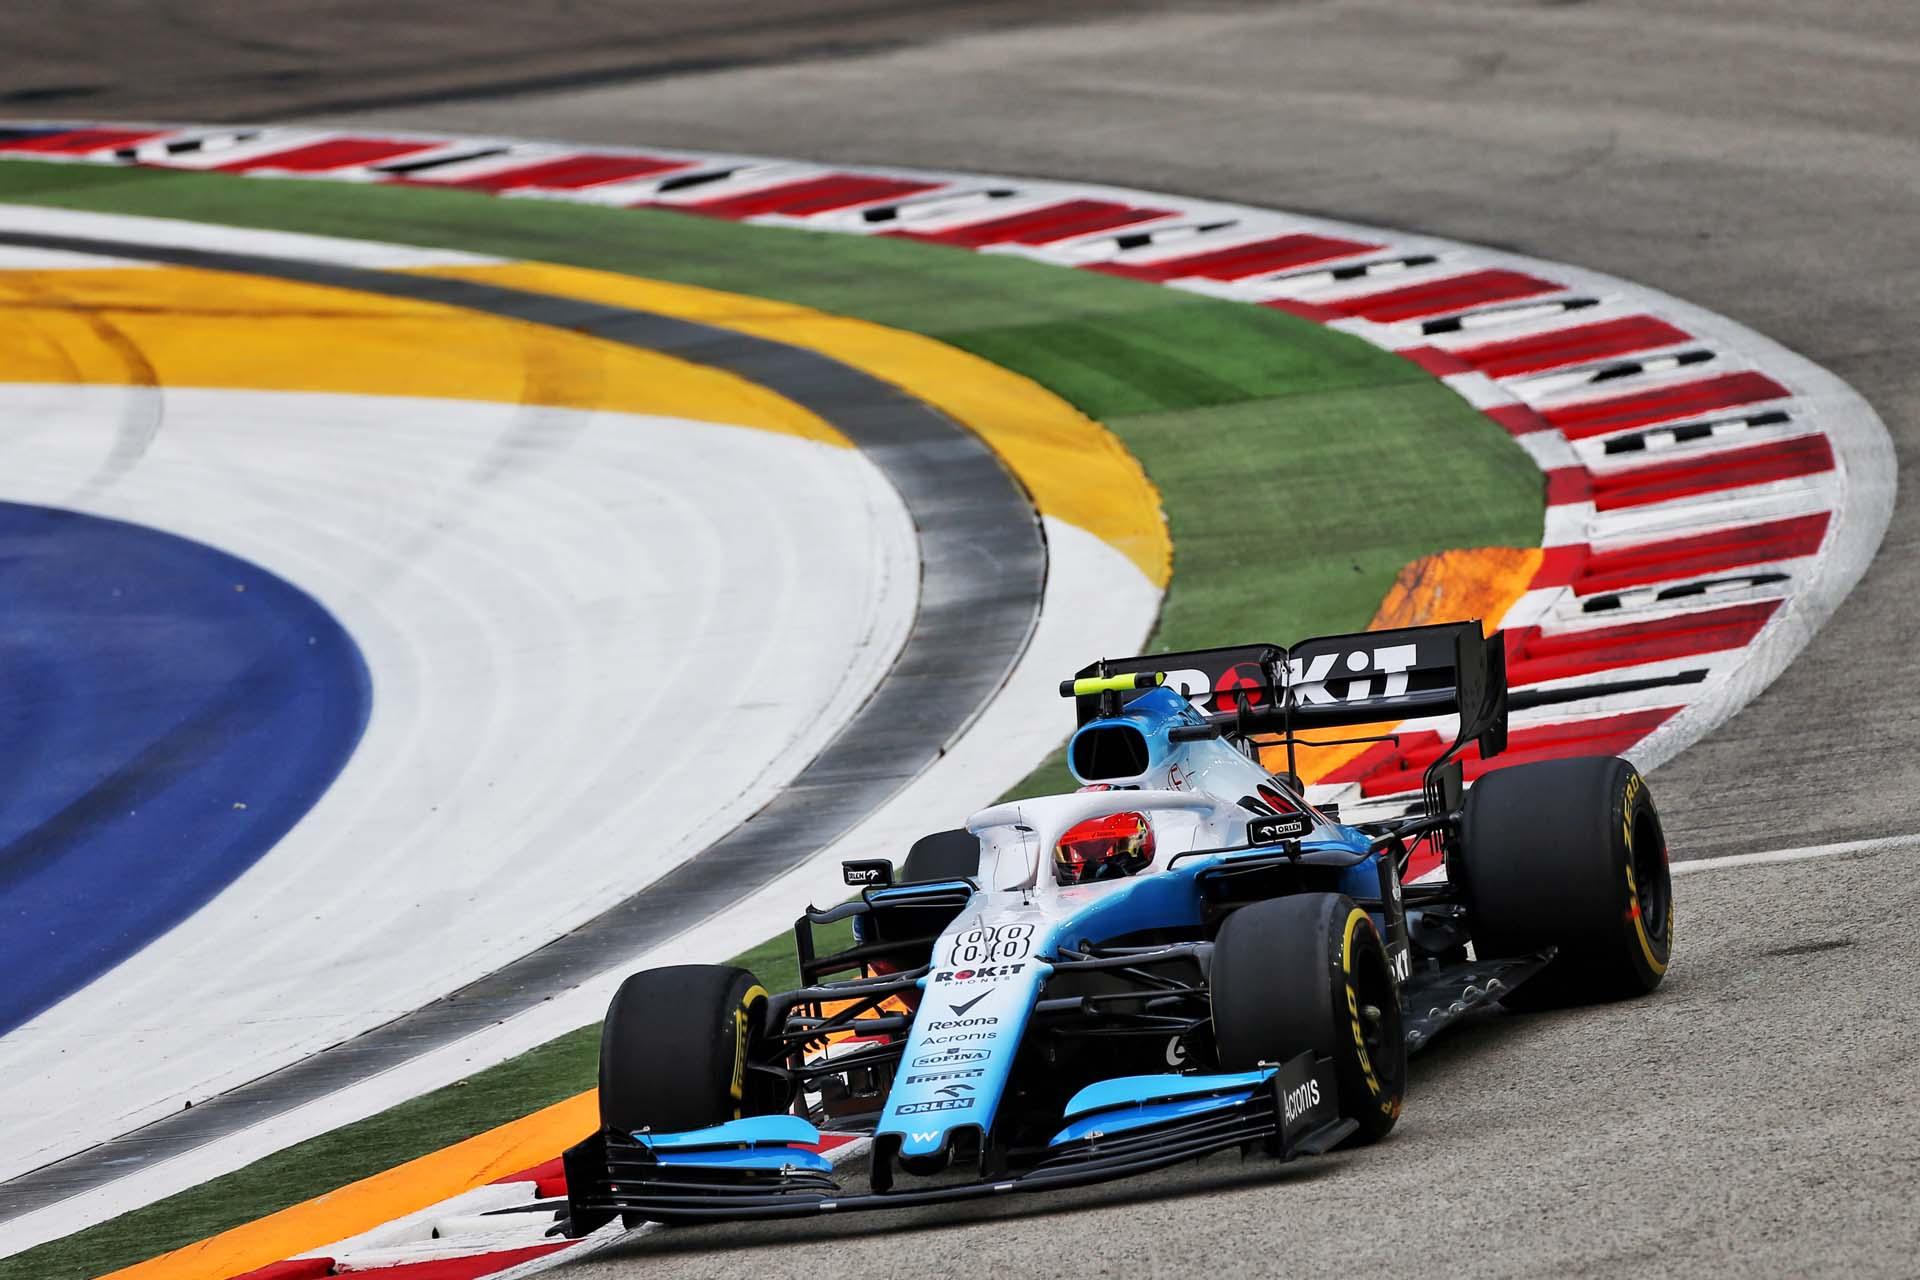 Motor Racing - Formula One World Championship - Singapore Grand Prix - Practice Day - Singapore, Singapore